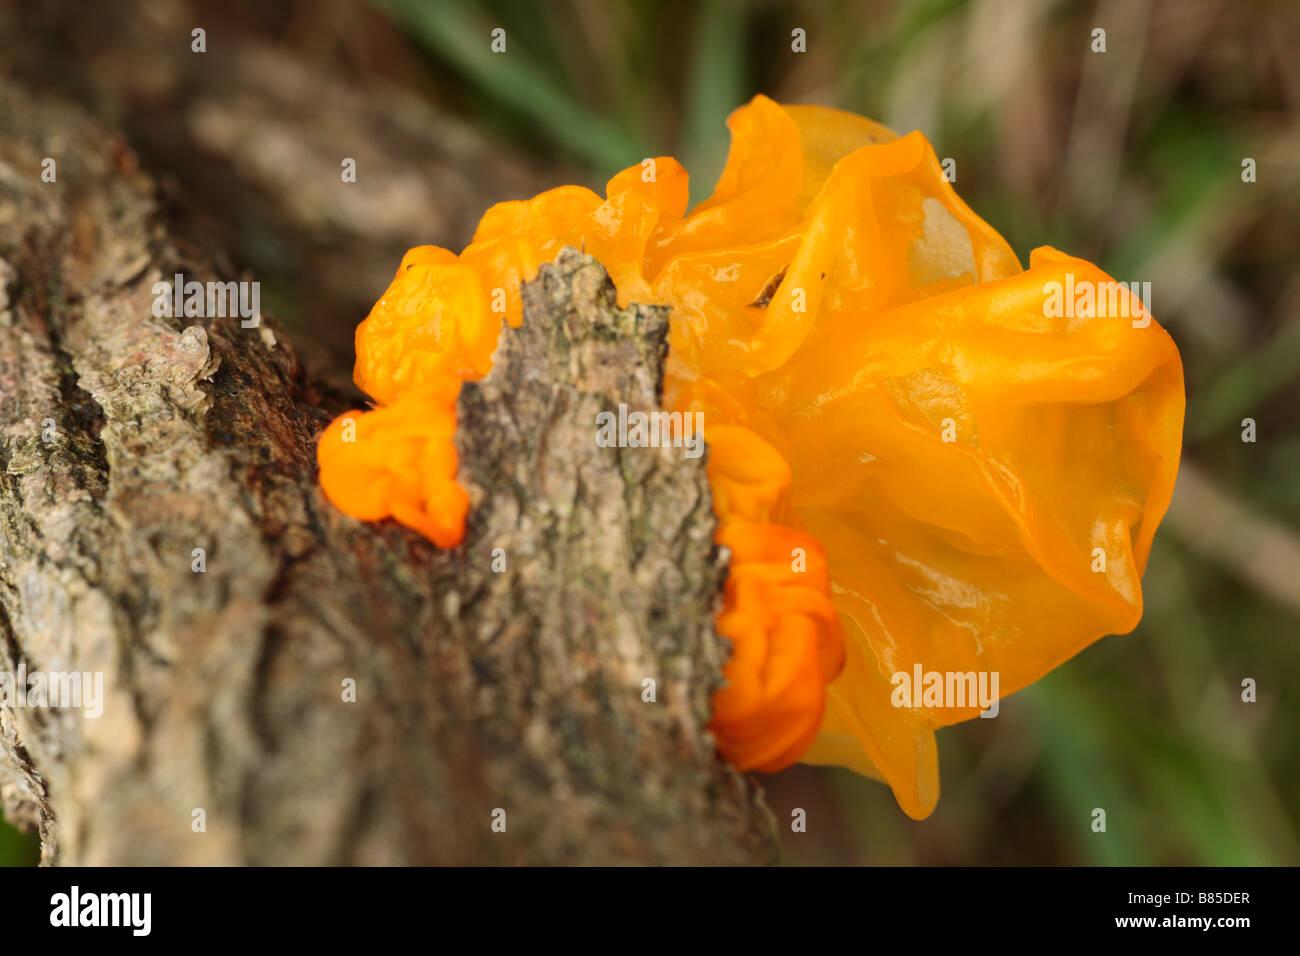 Yellow Brain fungus (Tremella mesenterica) fruiting on a gorse stem. Powys, Wales. - Stock Image